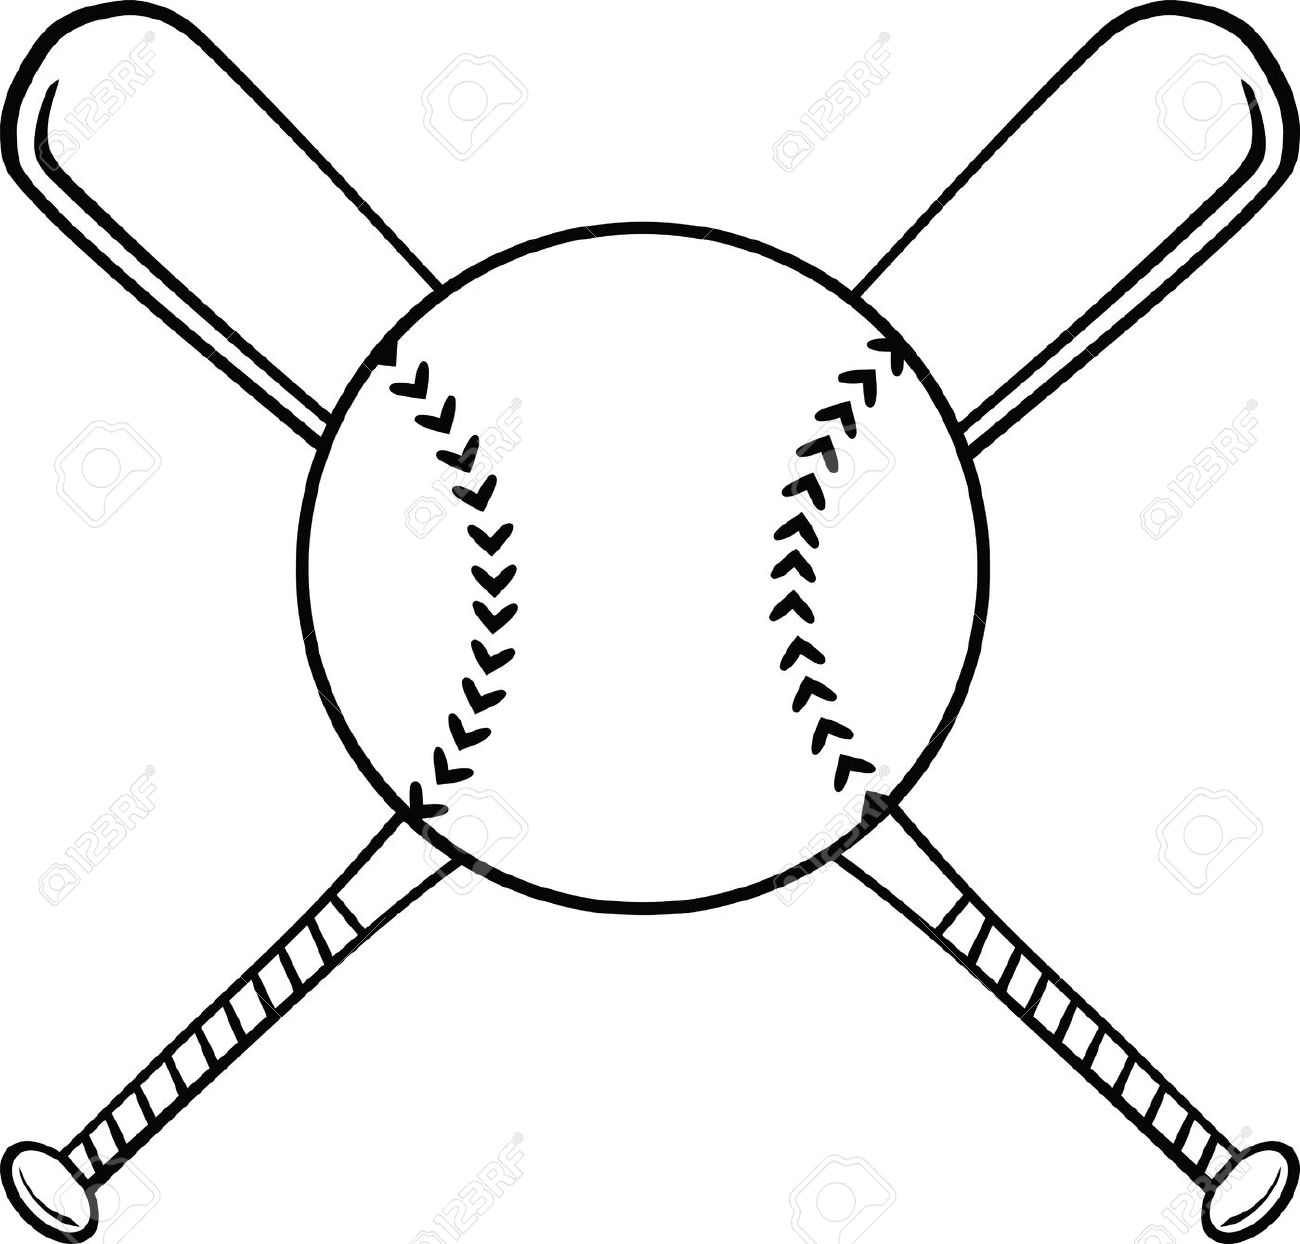 bat outline drawing at getdrawings com free for personal use bat rh getdrawings com